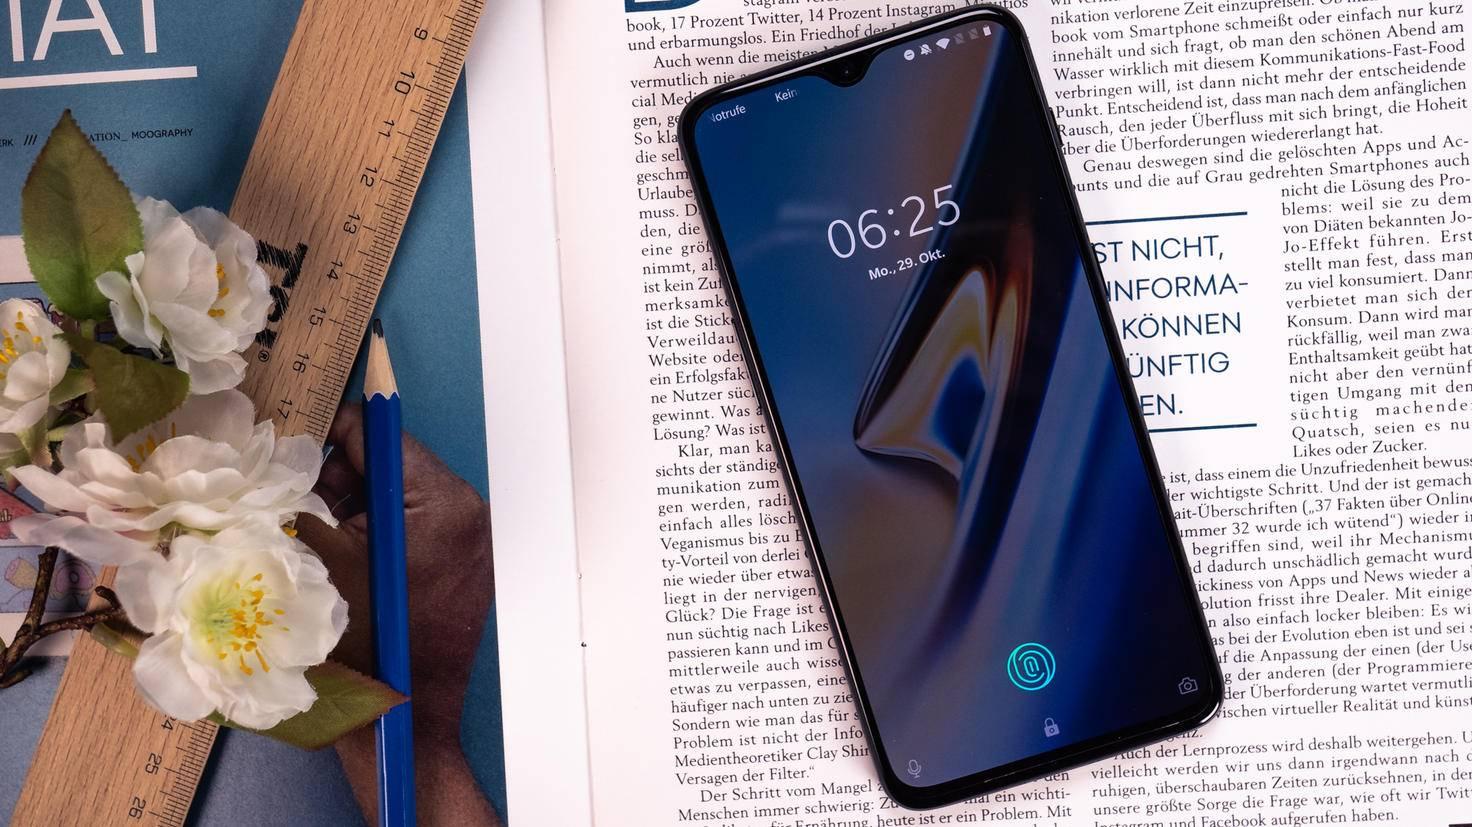 OnePlus-6T-TURN-ON-8